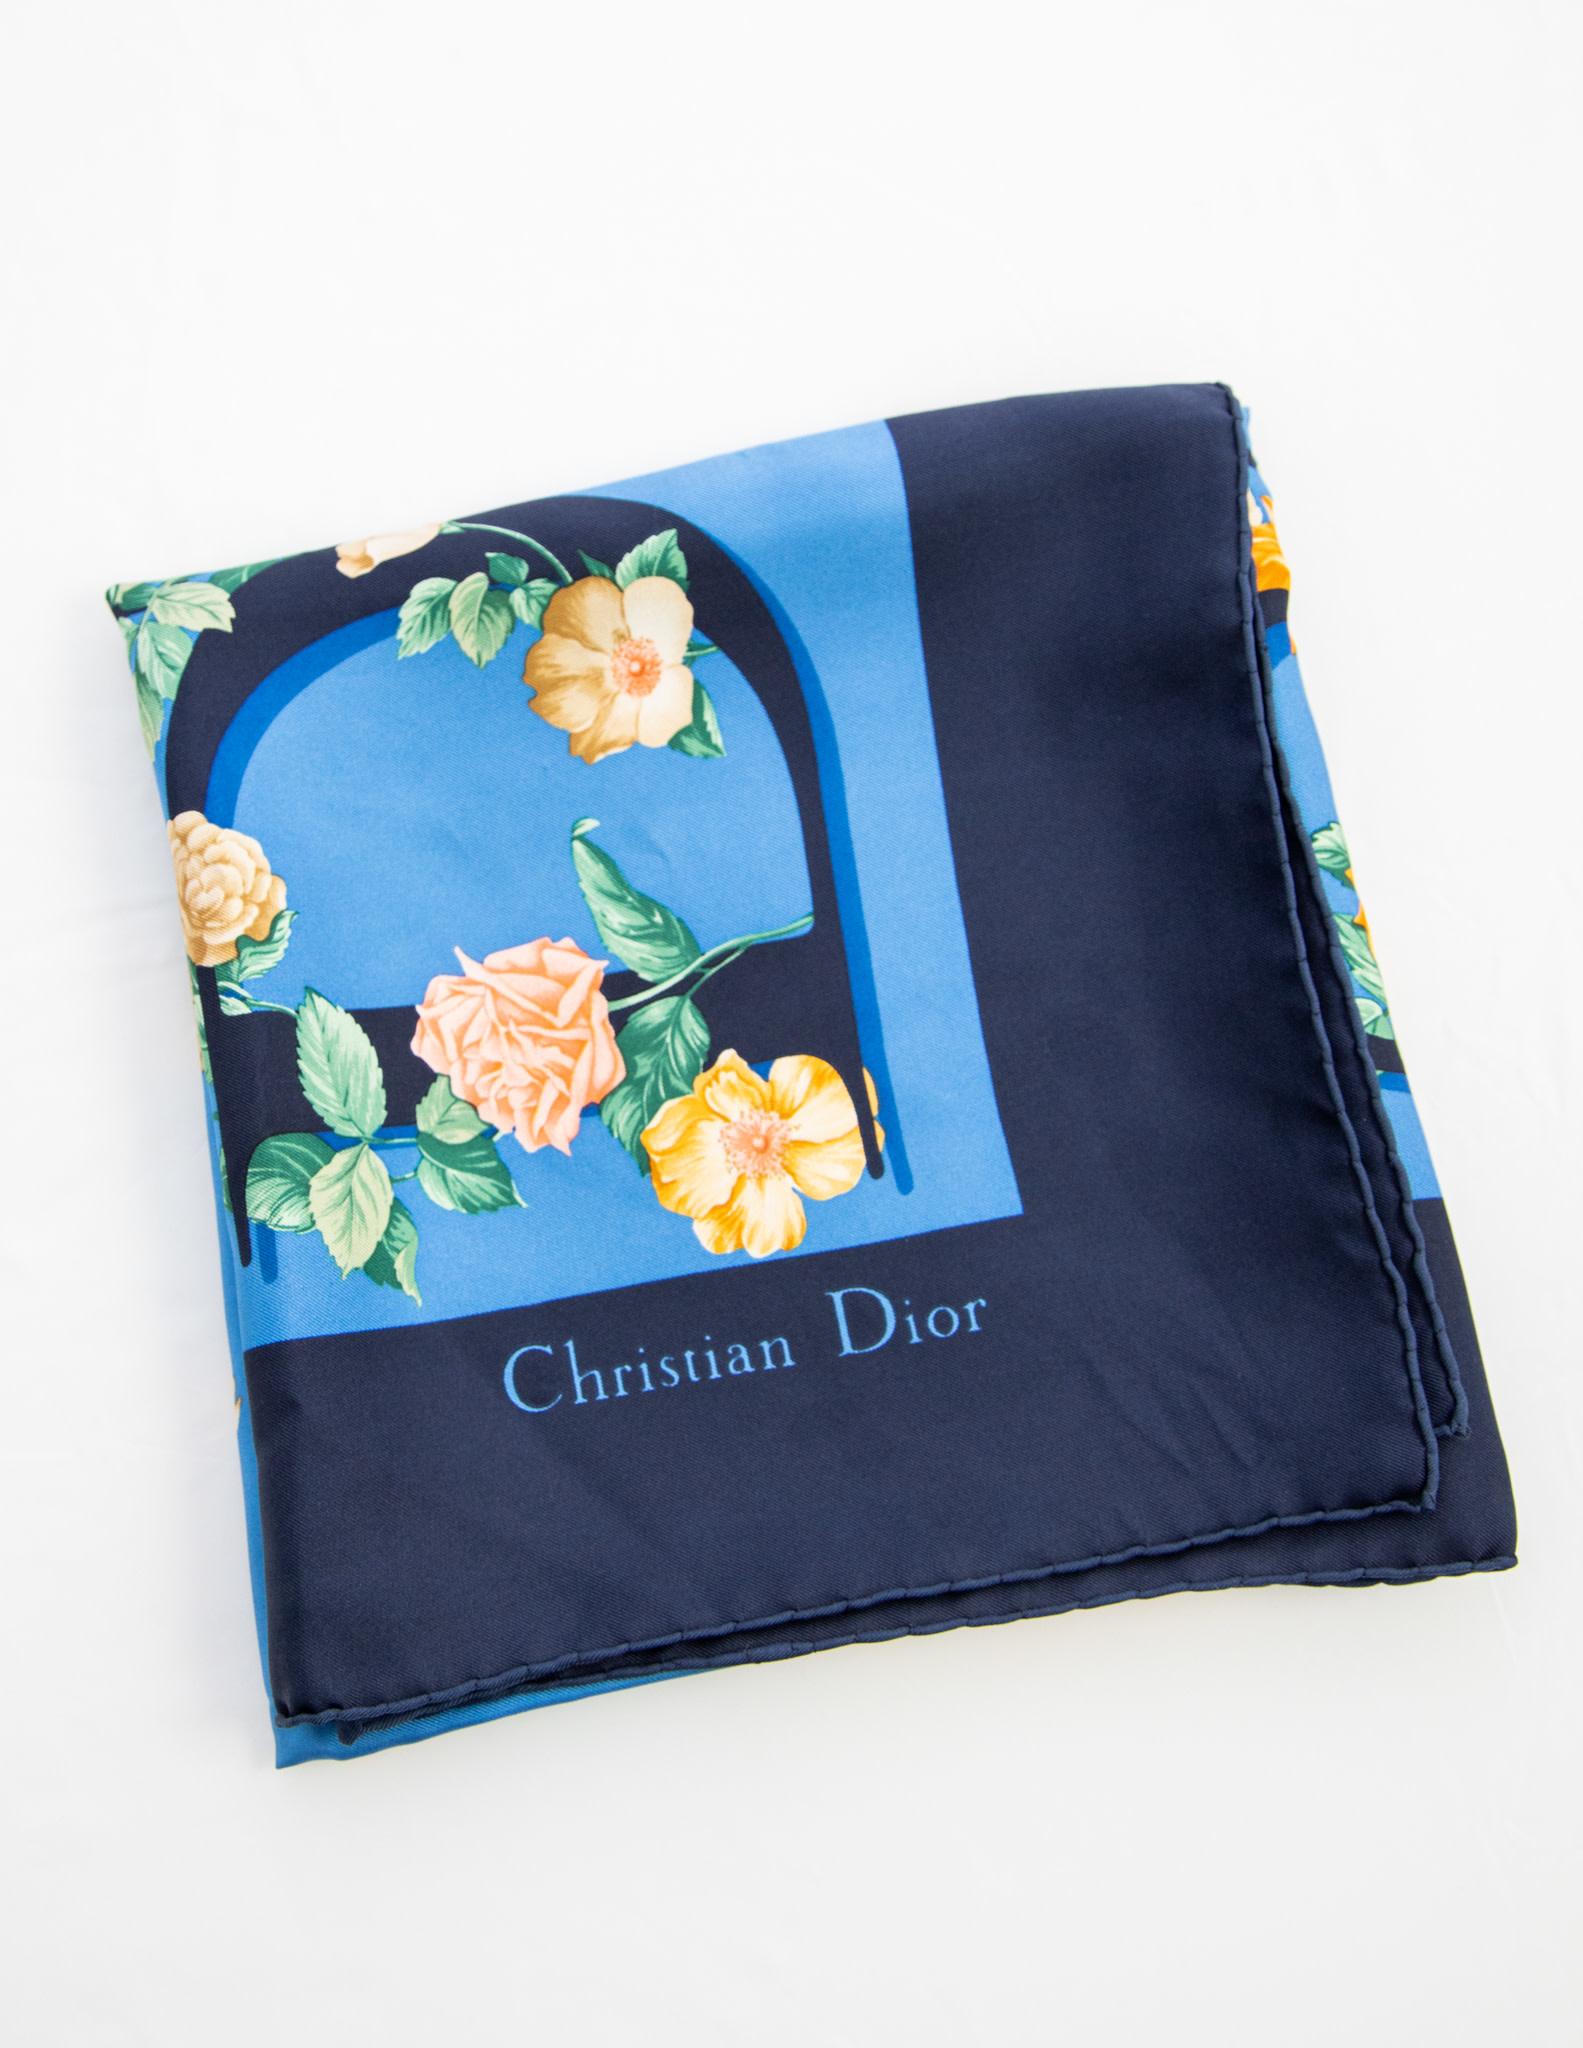 Christian Dior Floral Print Silk Scarf